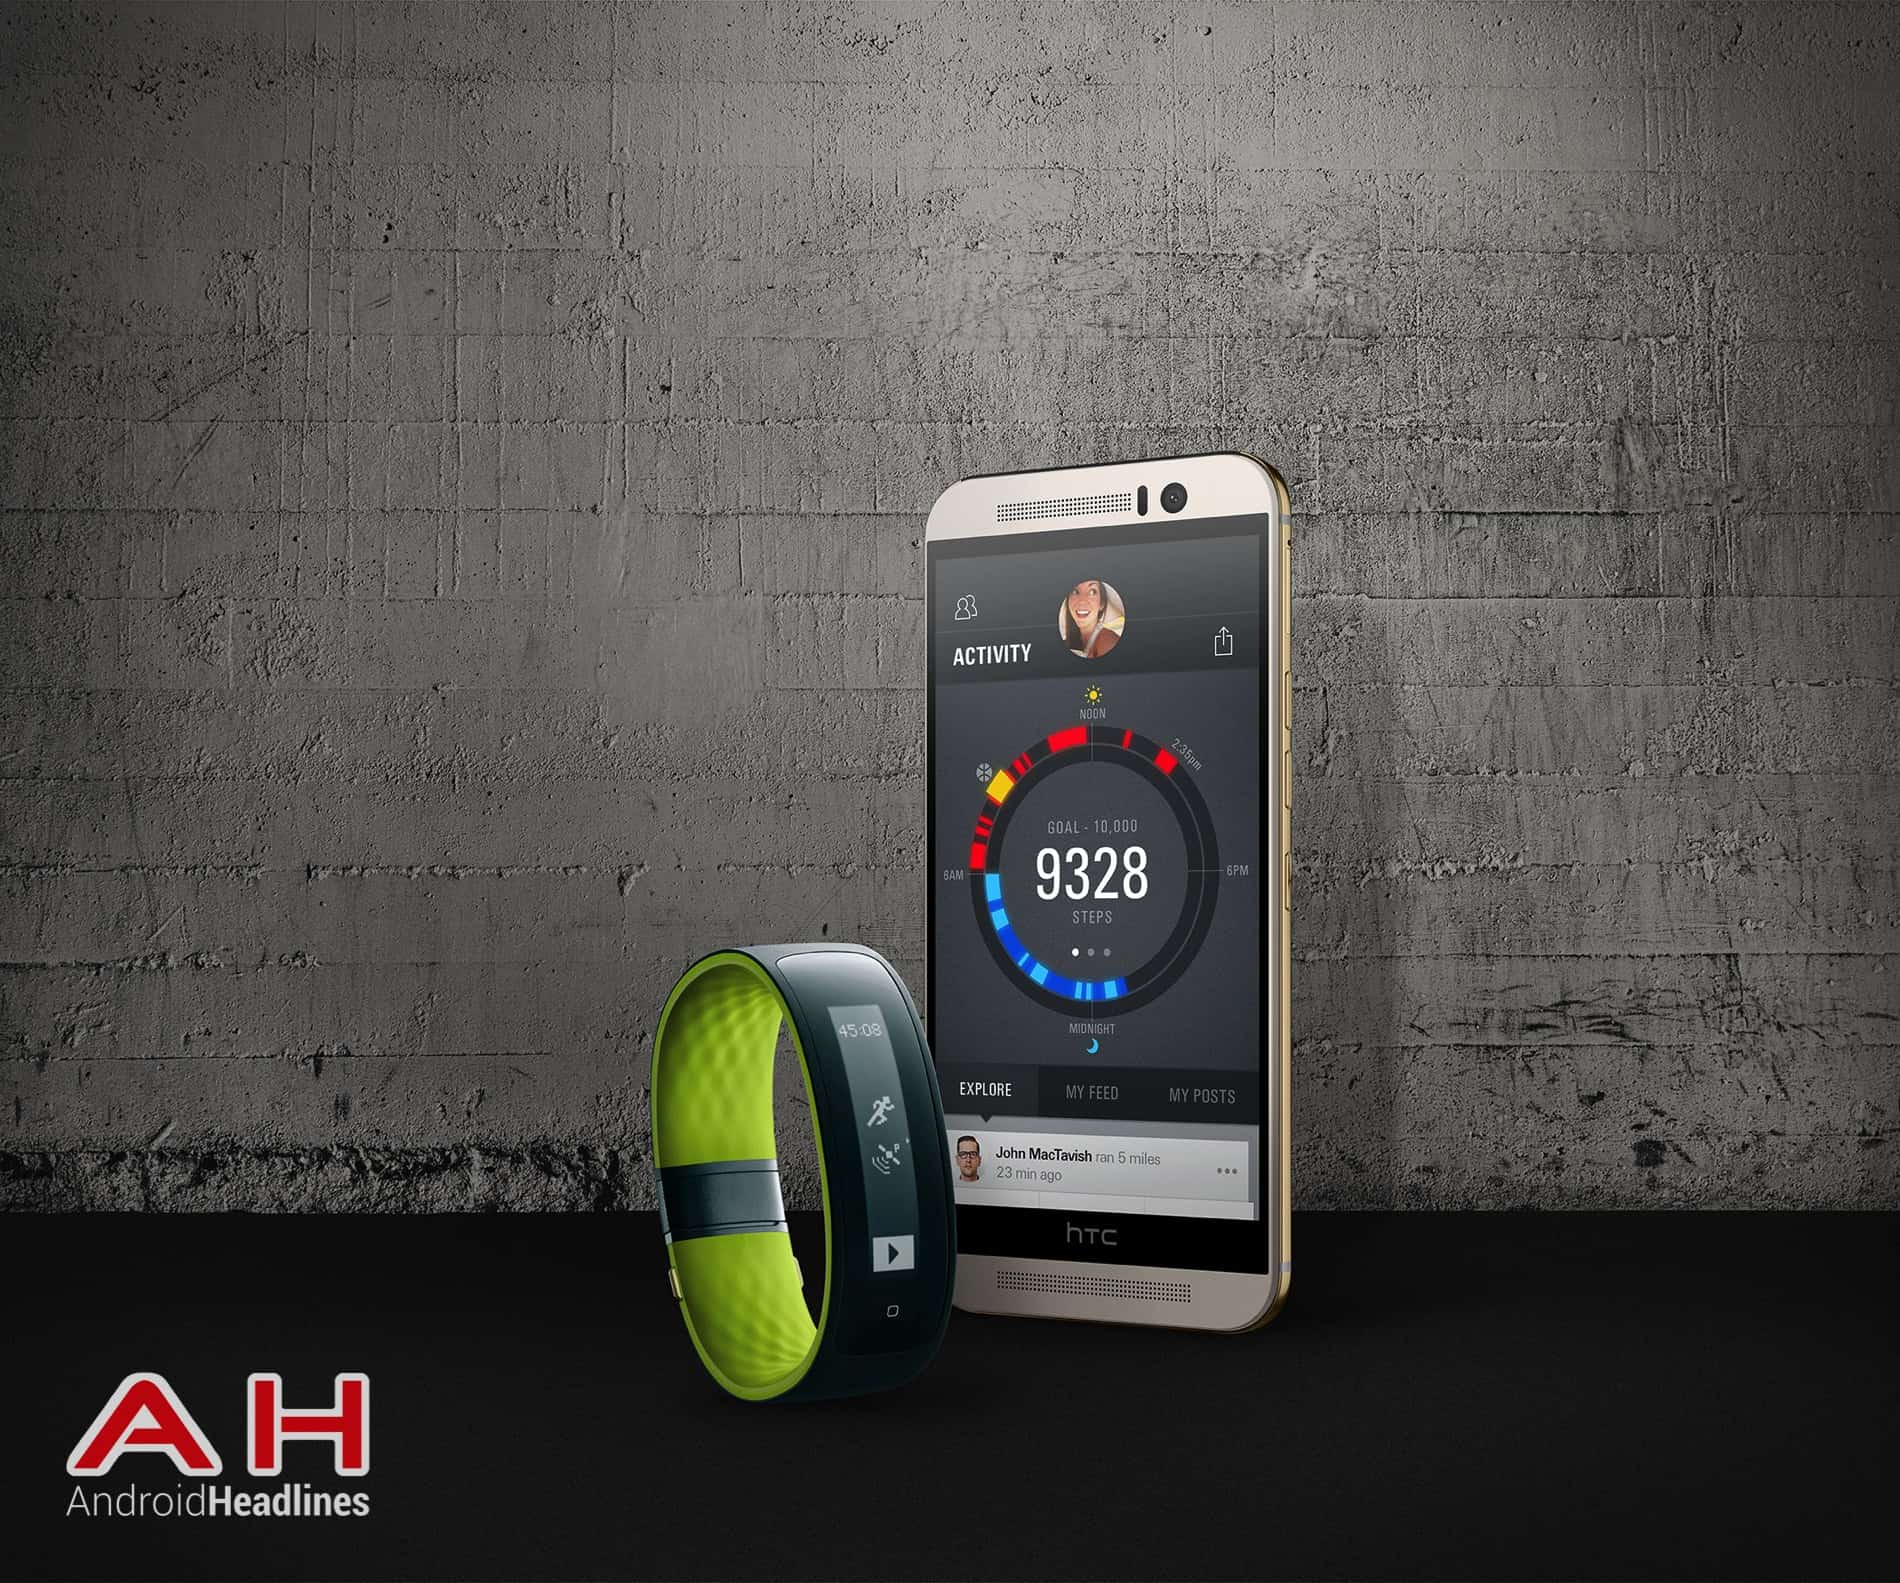 HTC Re Grip AH 1